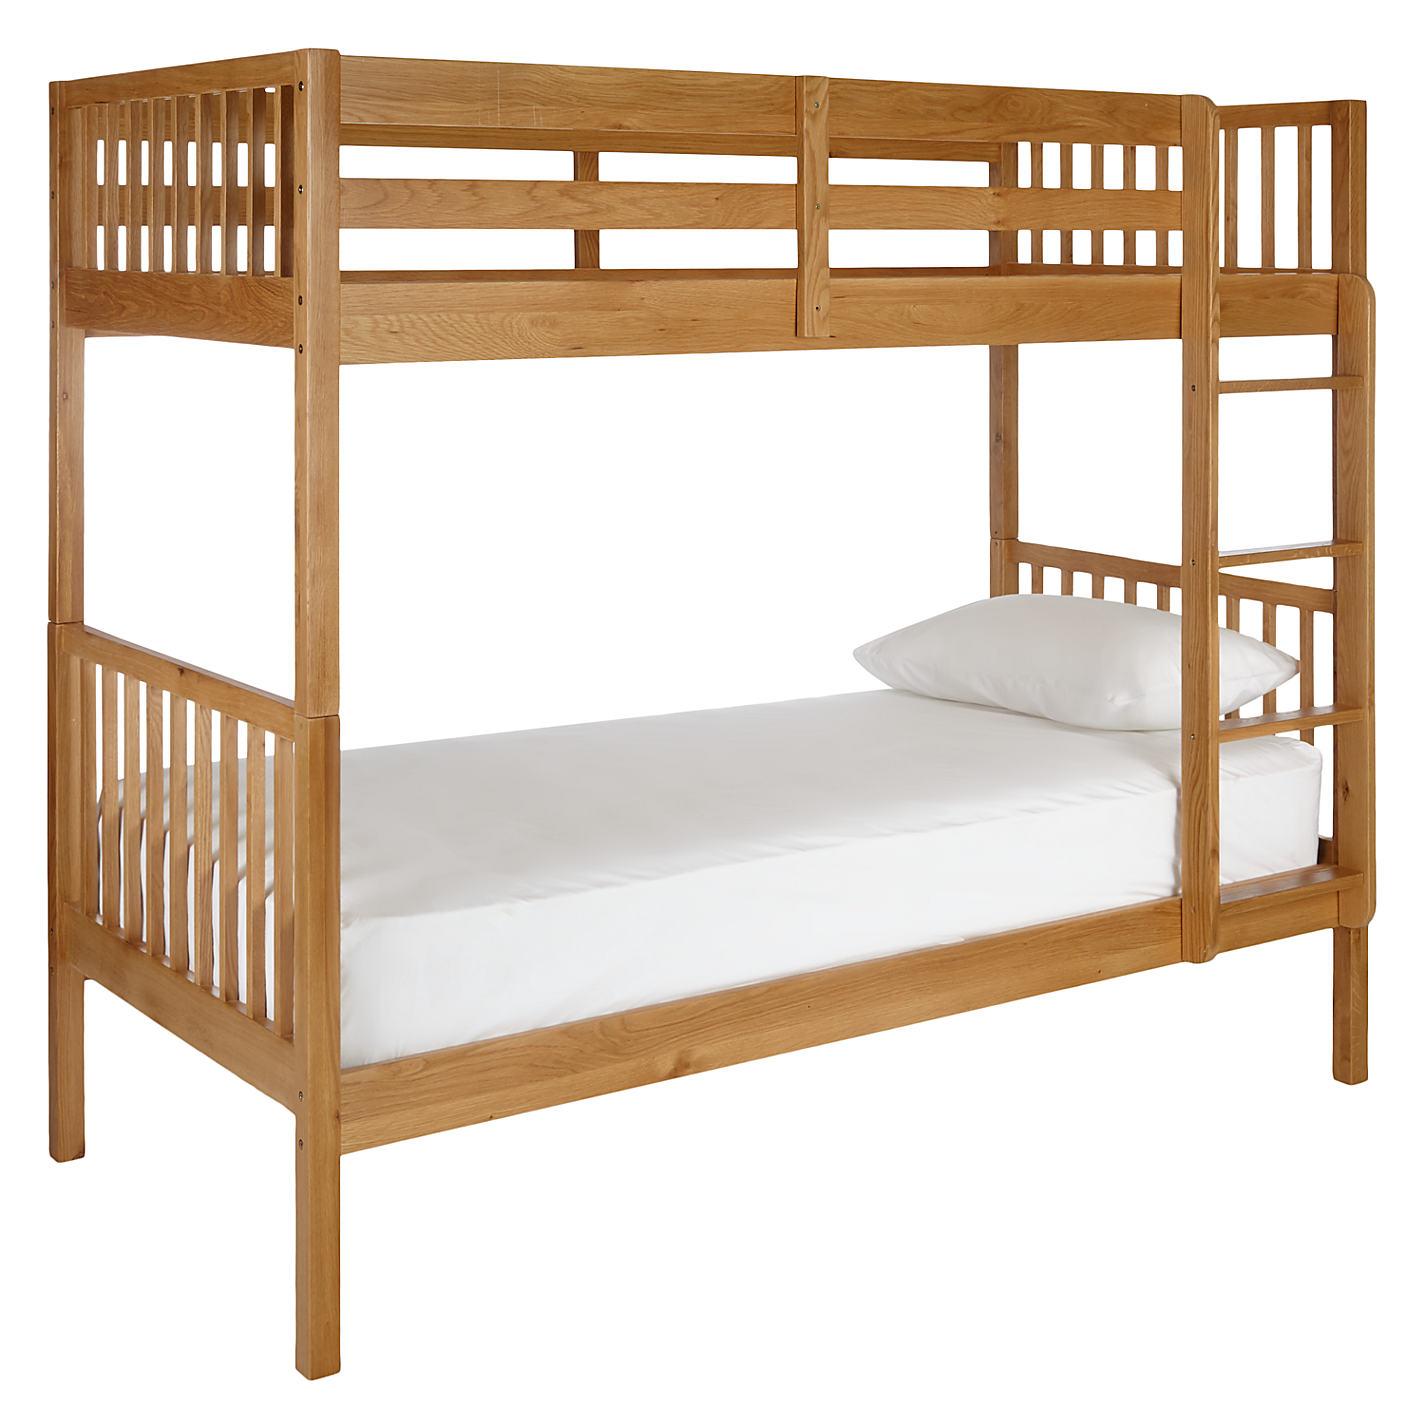 Buy John Lewis Morgan Story Time Bunk Bed Oak Online At Johnlewis